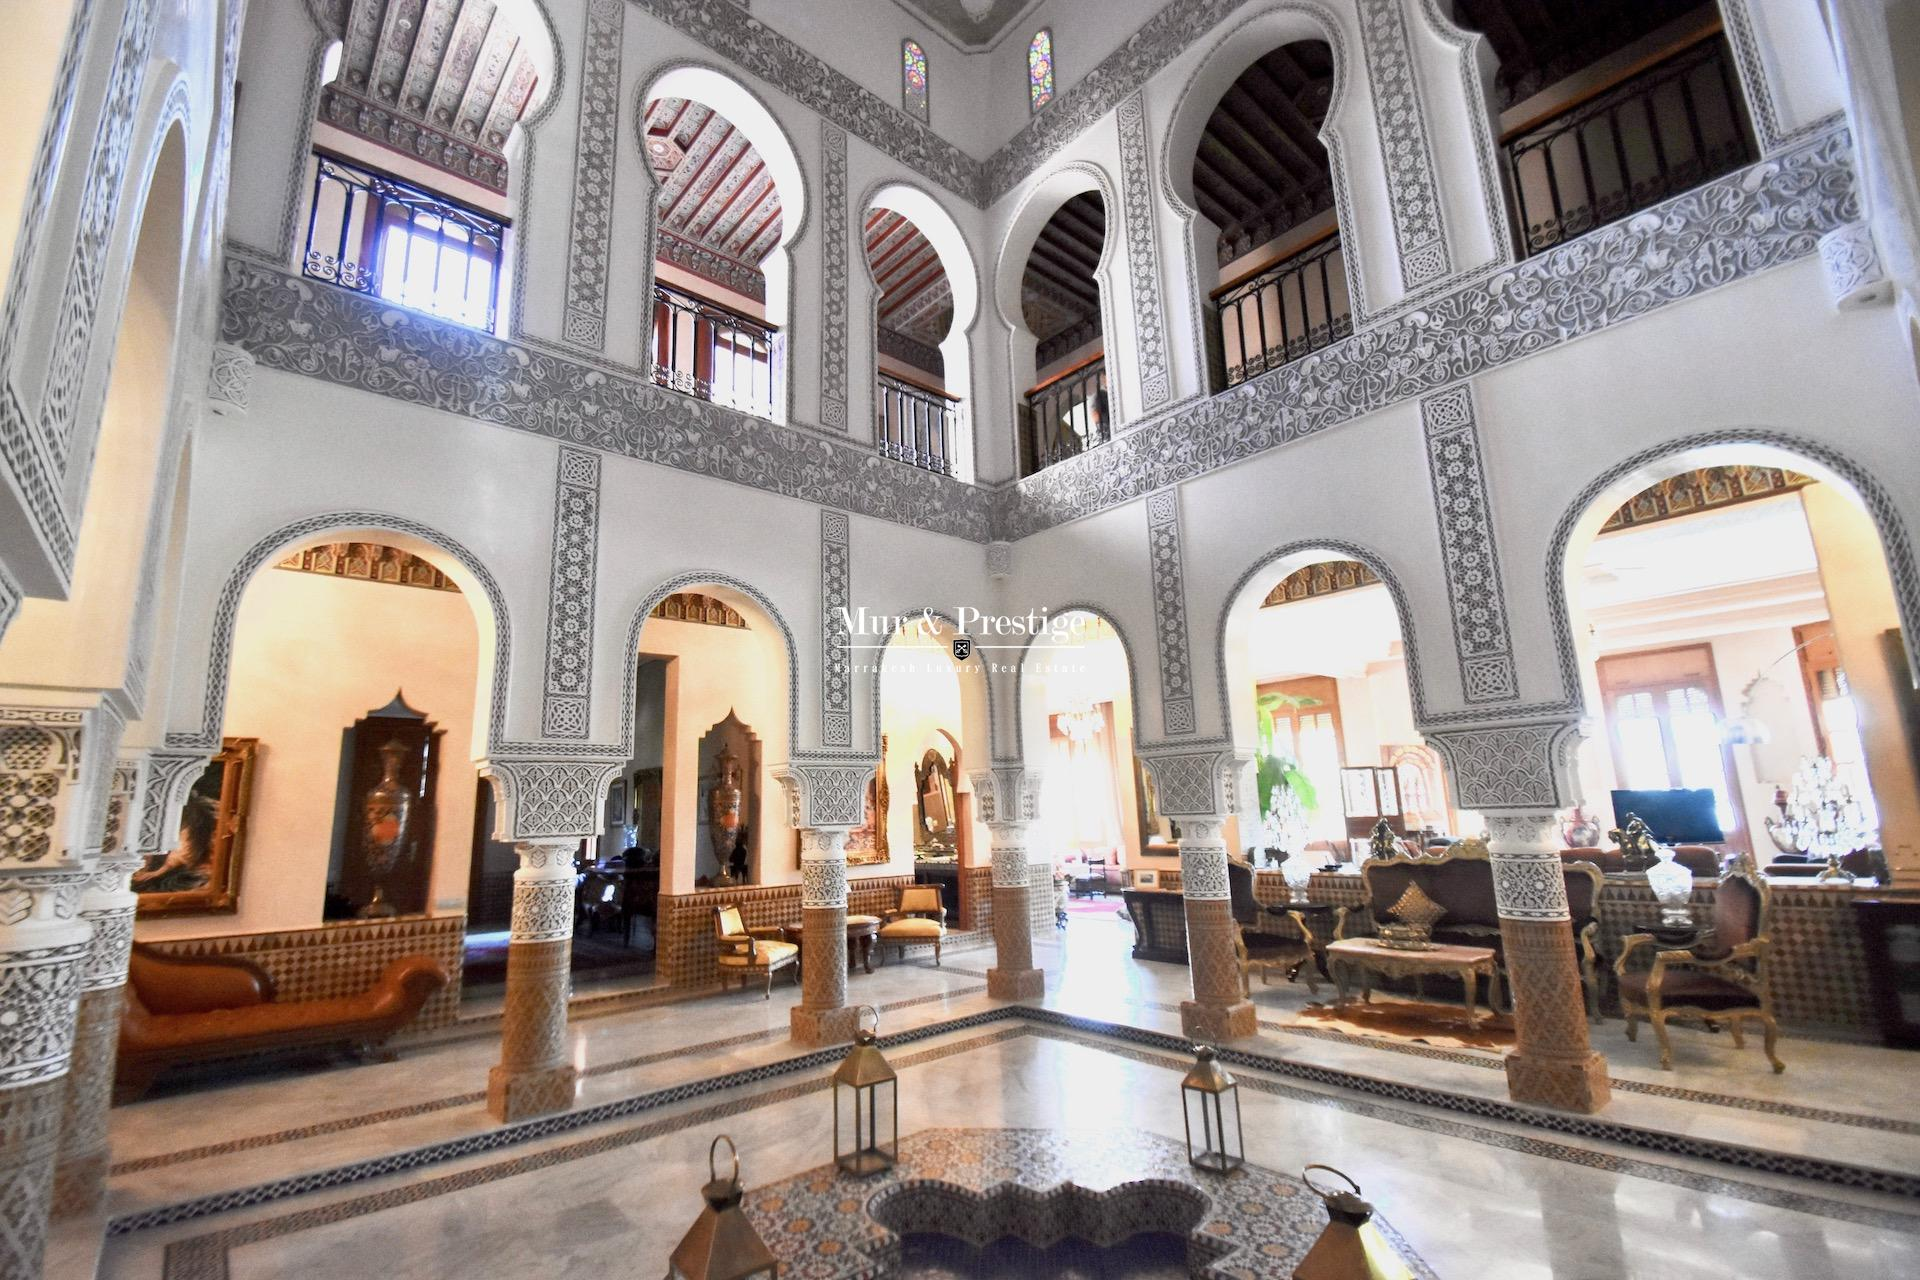 Propri�t� de style marocain en vente � Marrakech